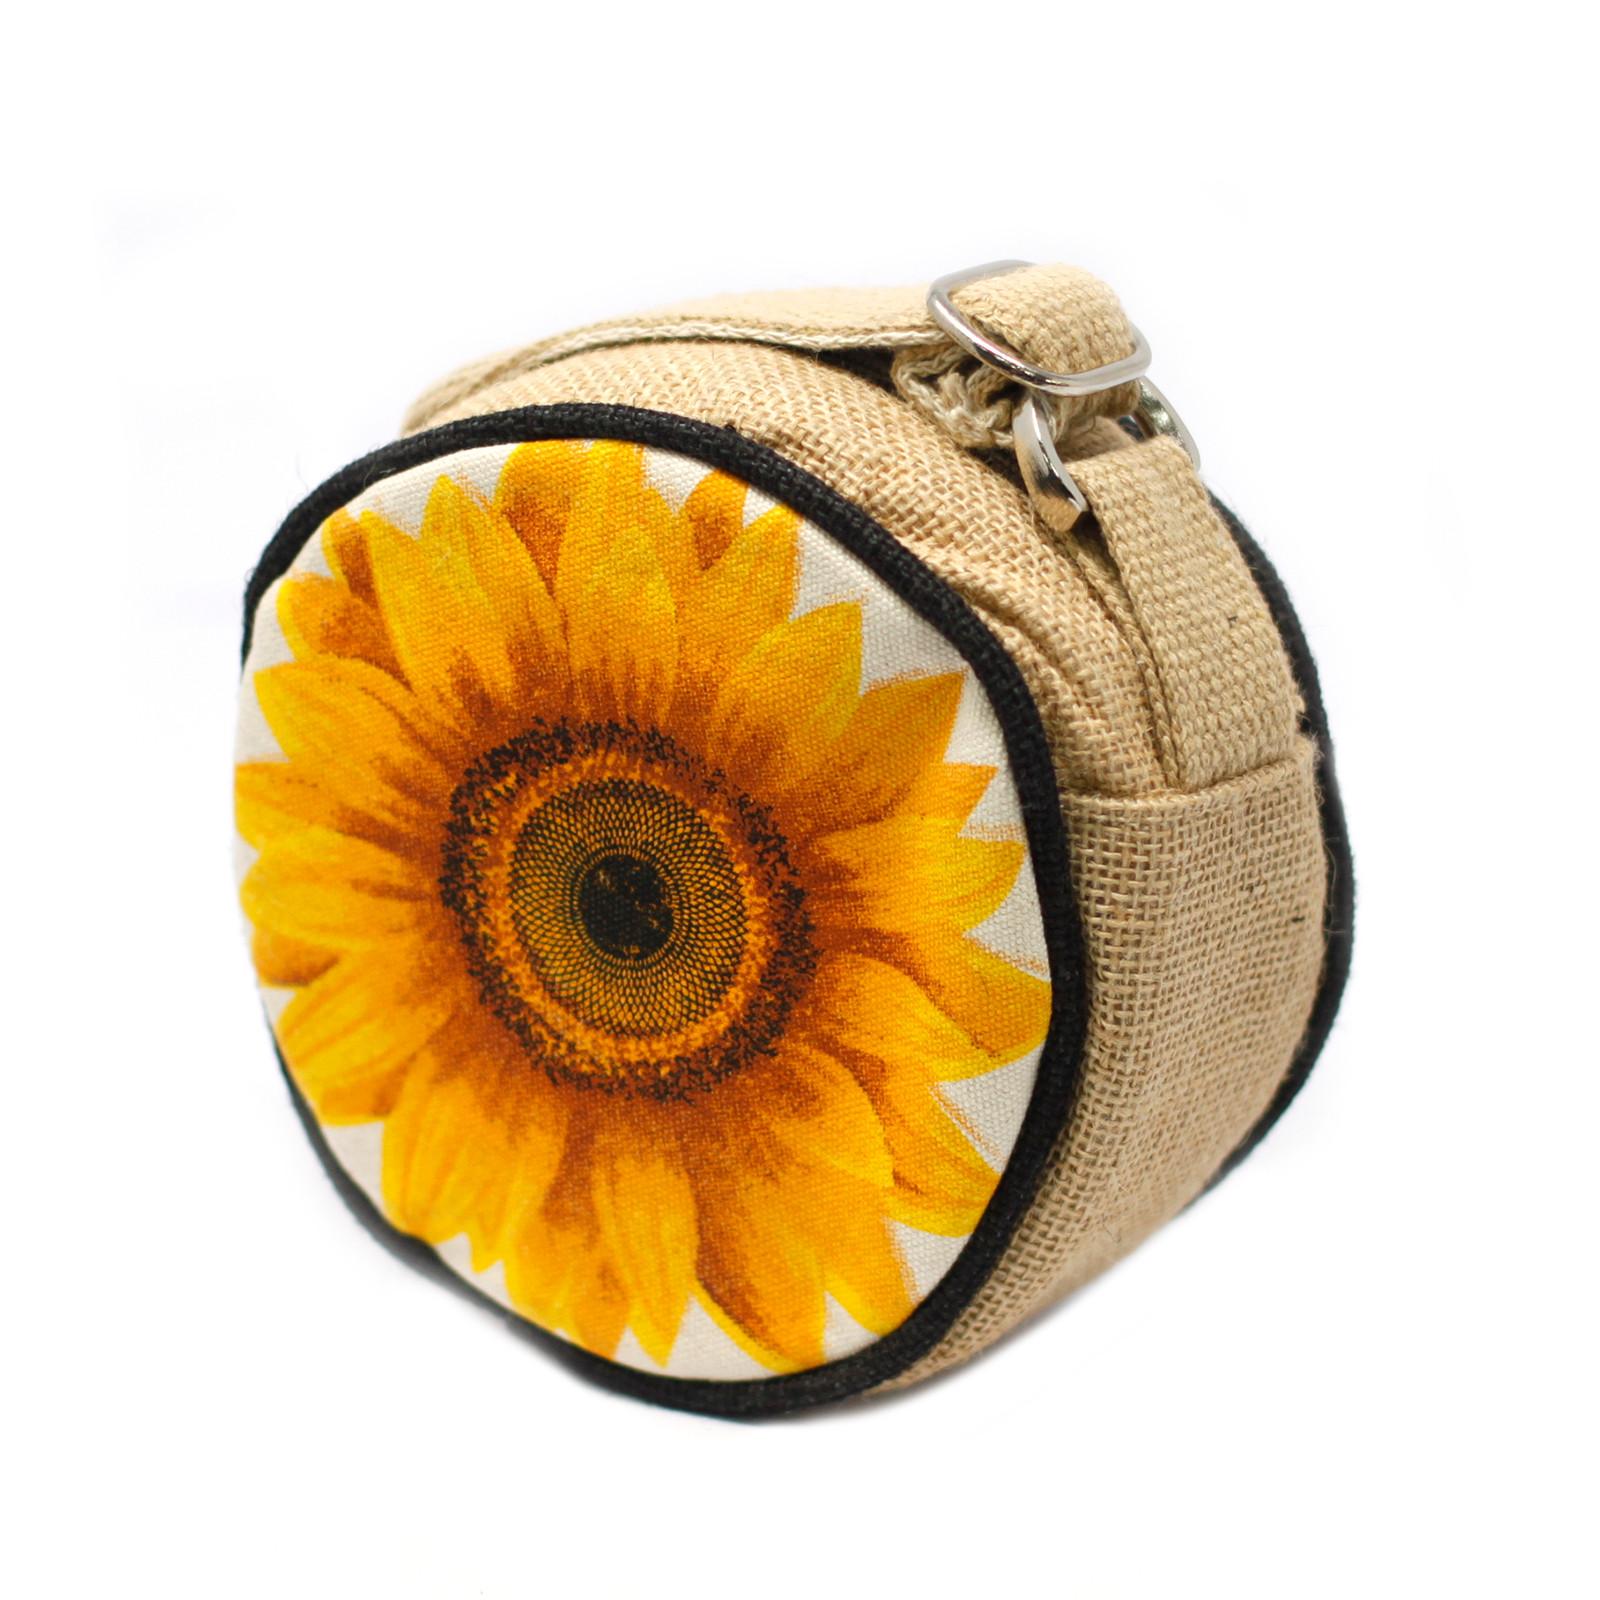 Eco Round Bag Small Sunflower